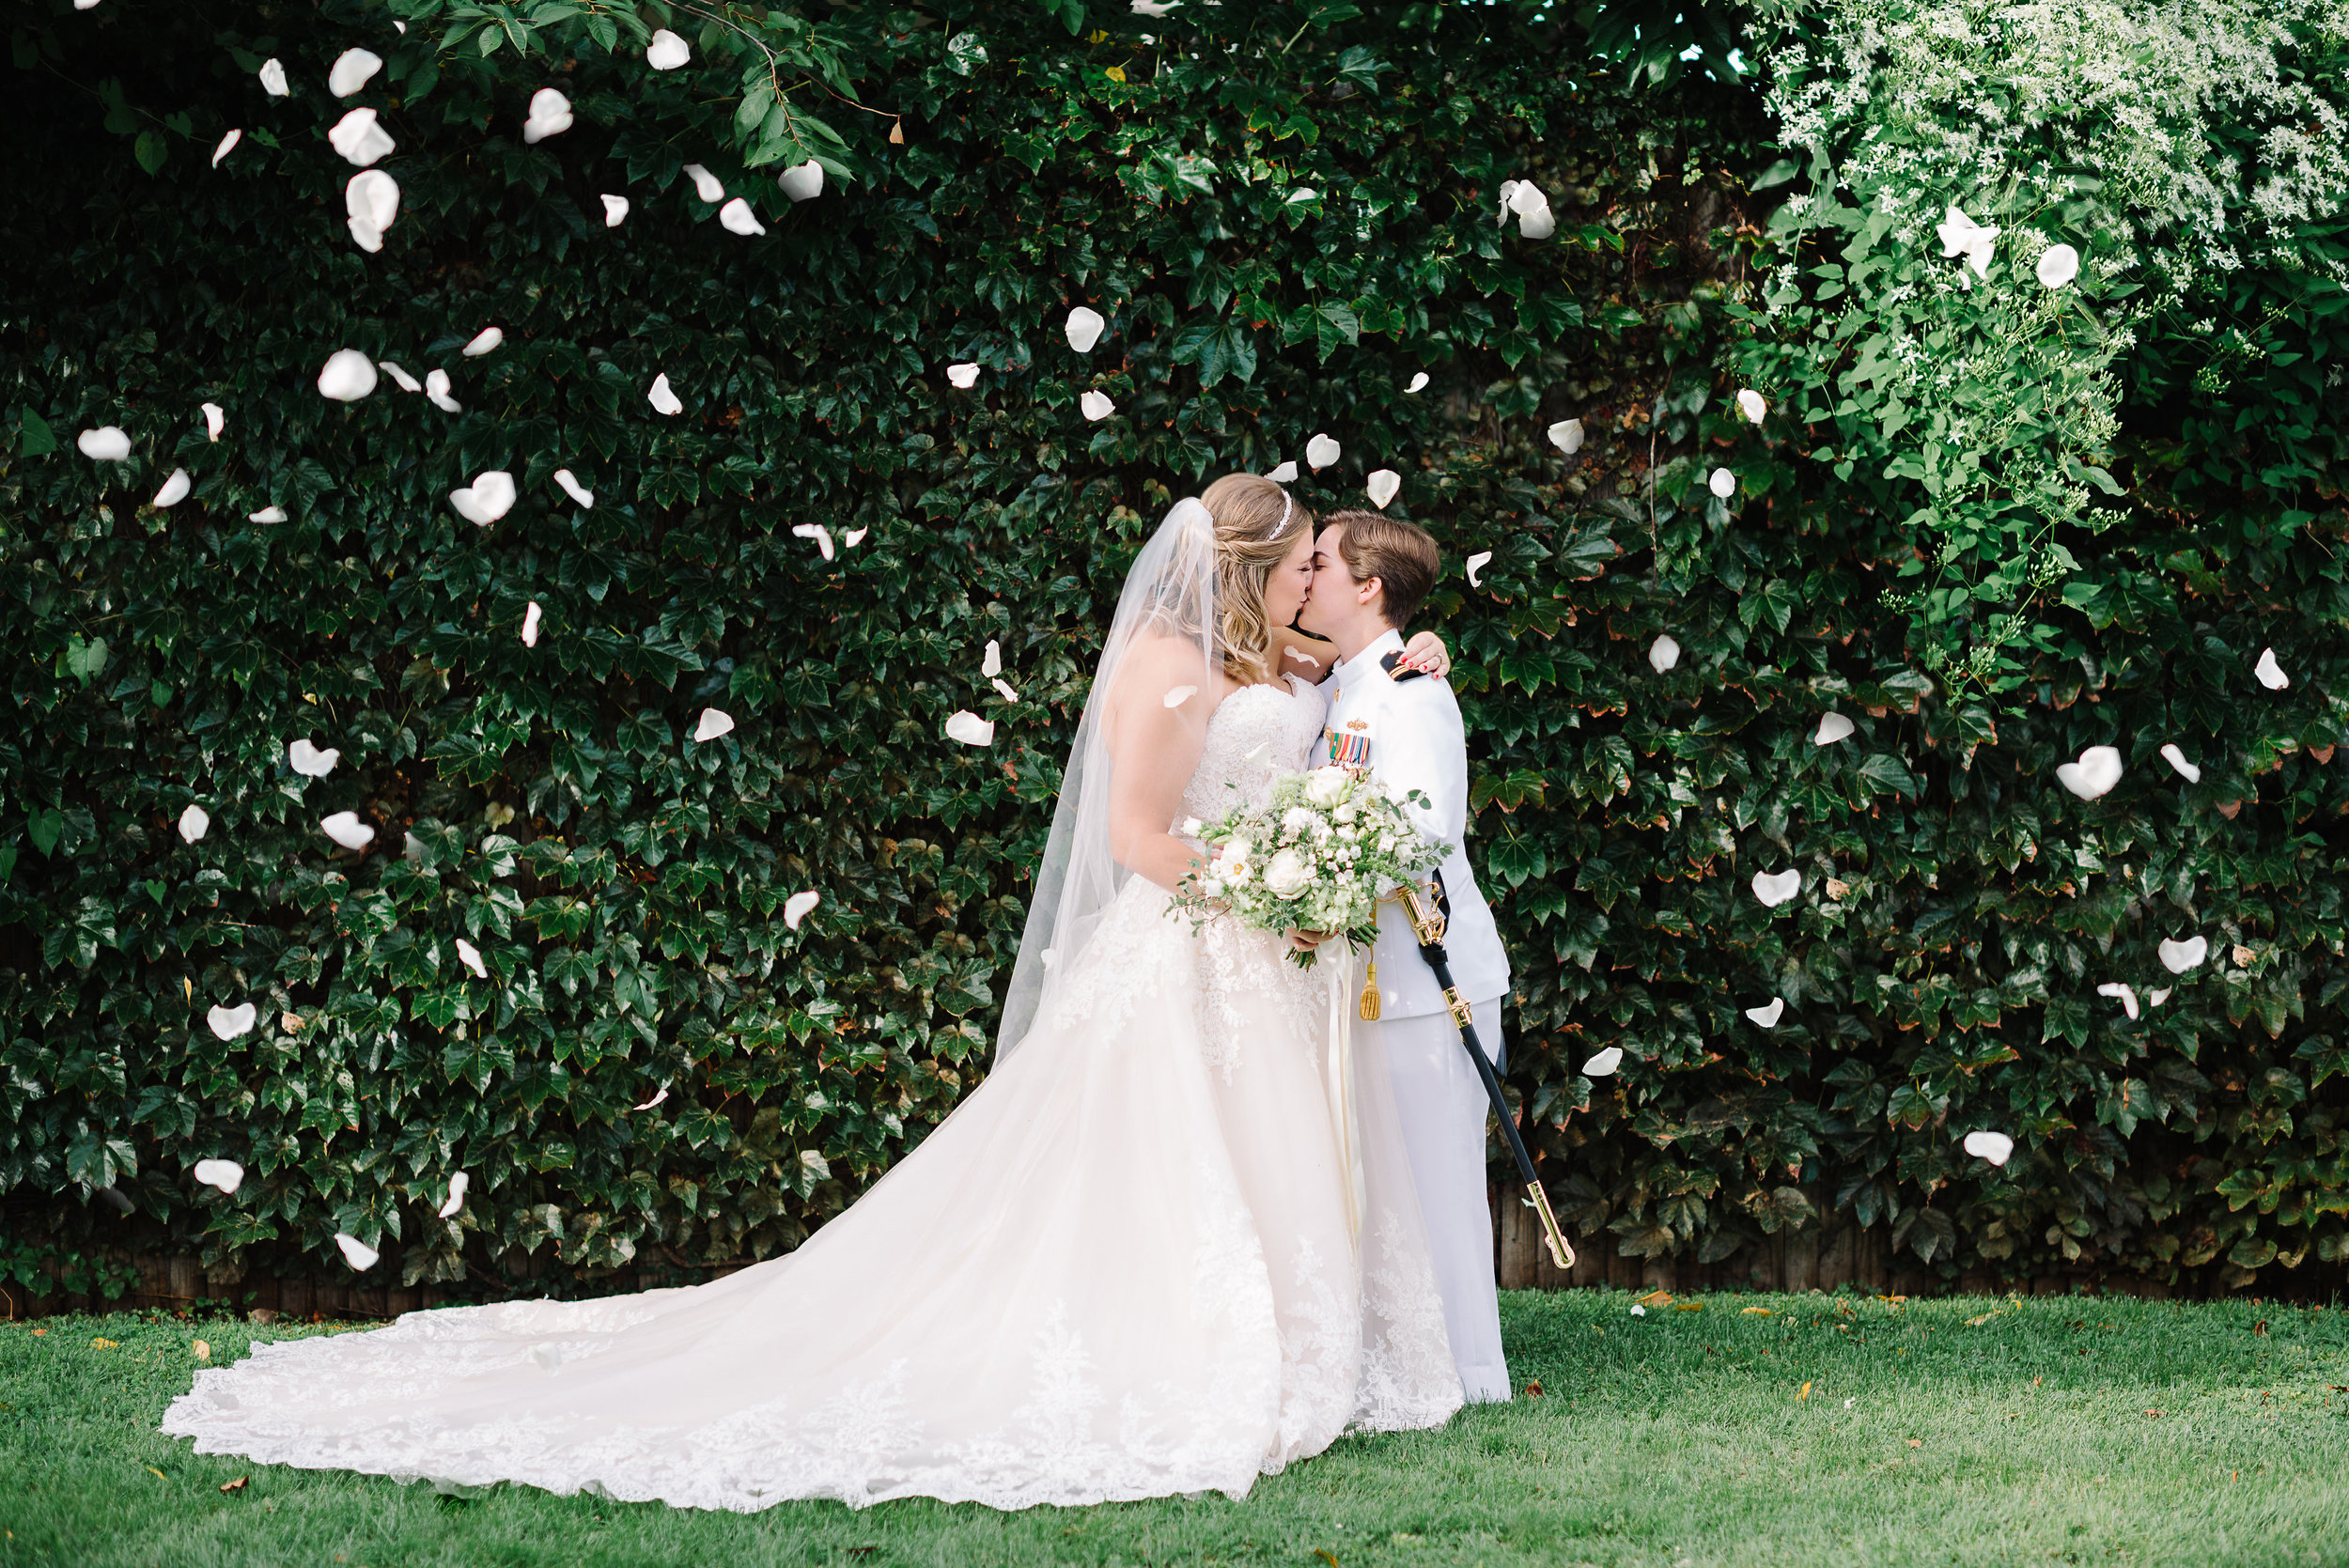 NormanPhotoPaper_SuttonSimila_Wedding-466.jpg